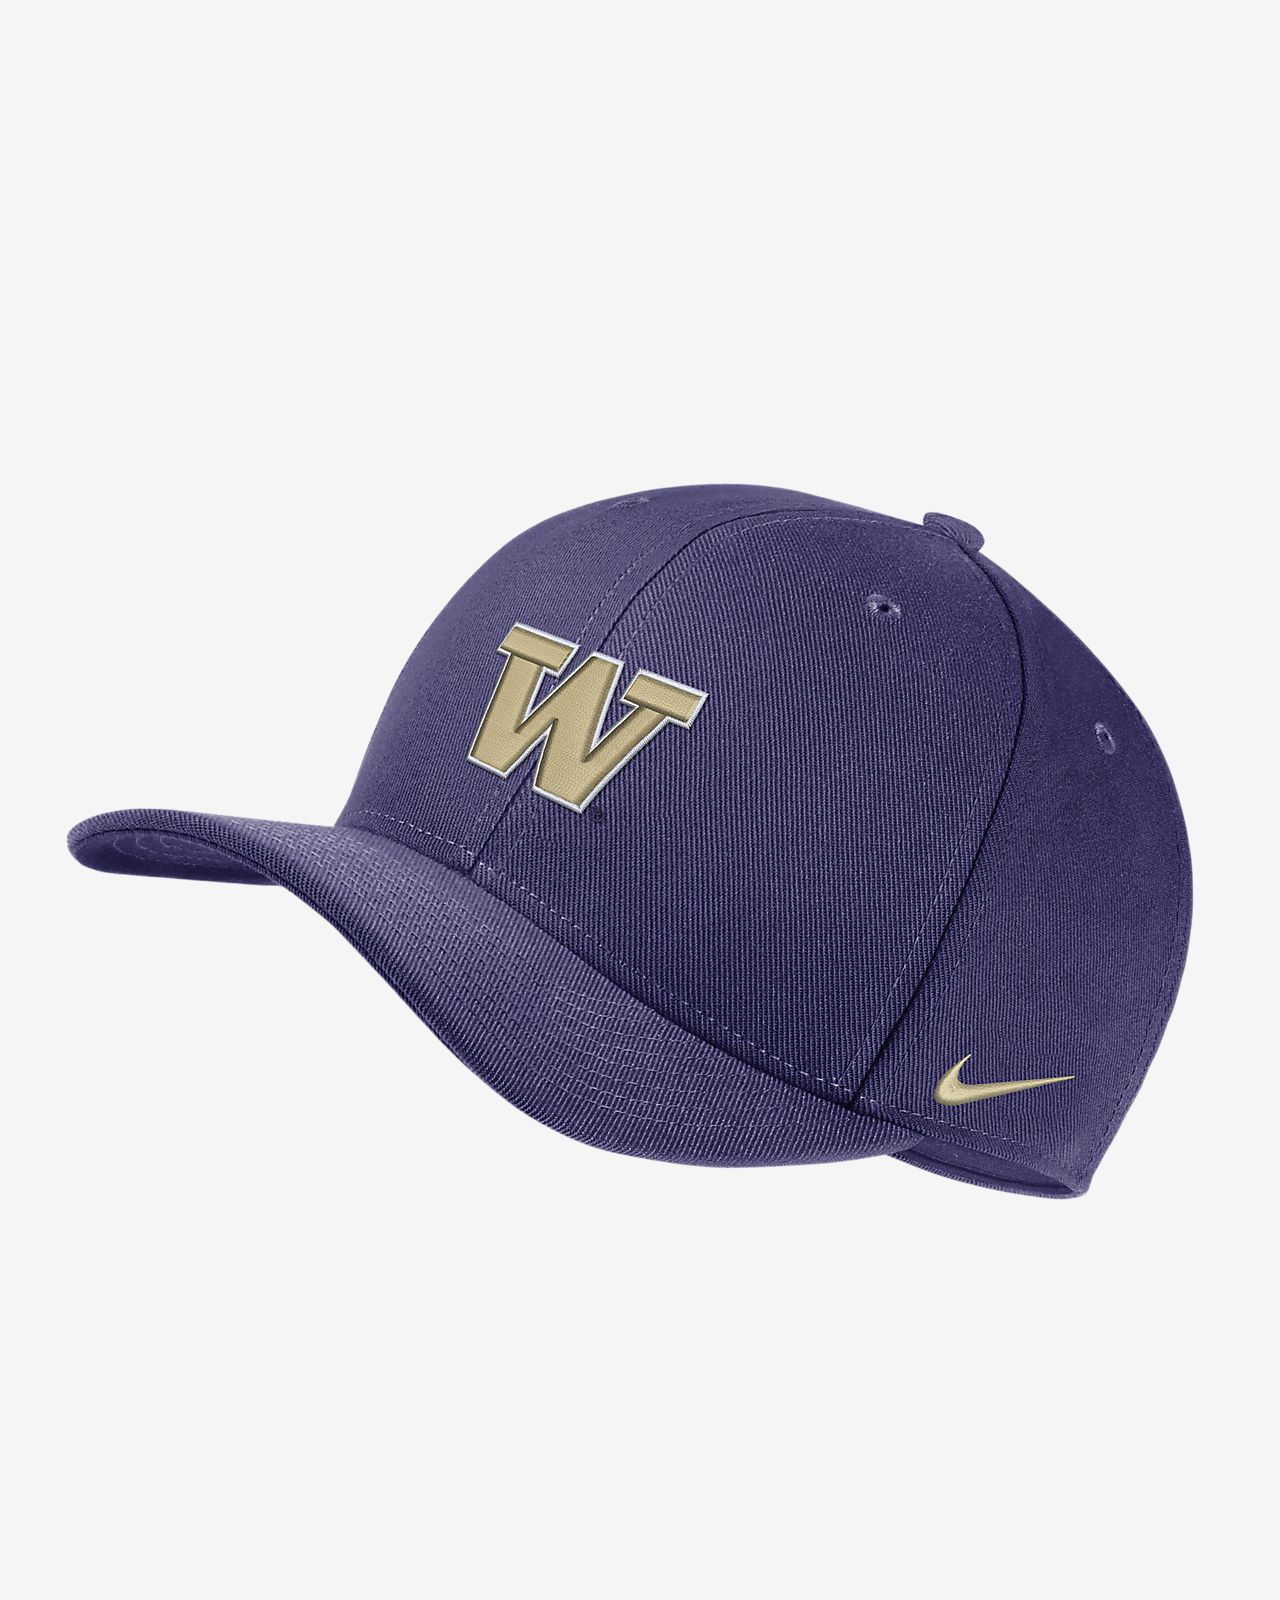 Nike College Dri-FIT Classic99 Swoosh Flex (Washington) Fitted Hat ... 60aa507d0a